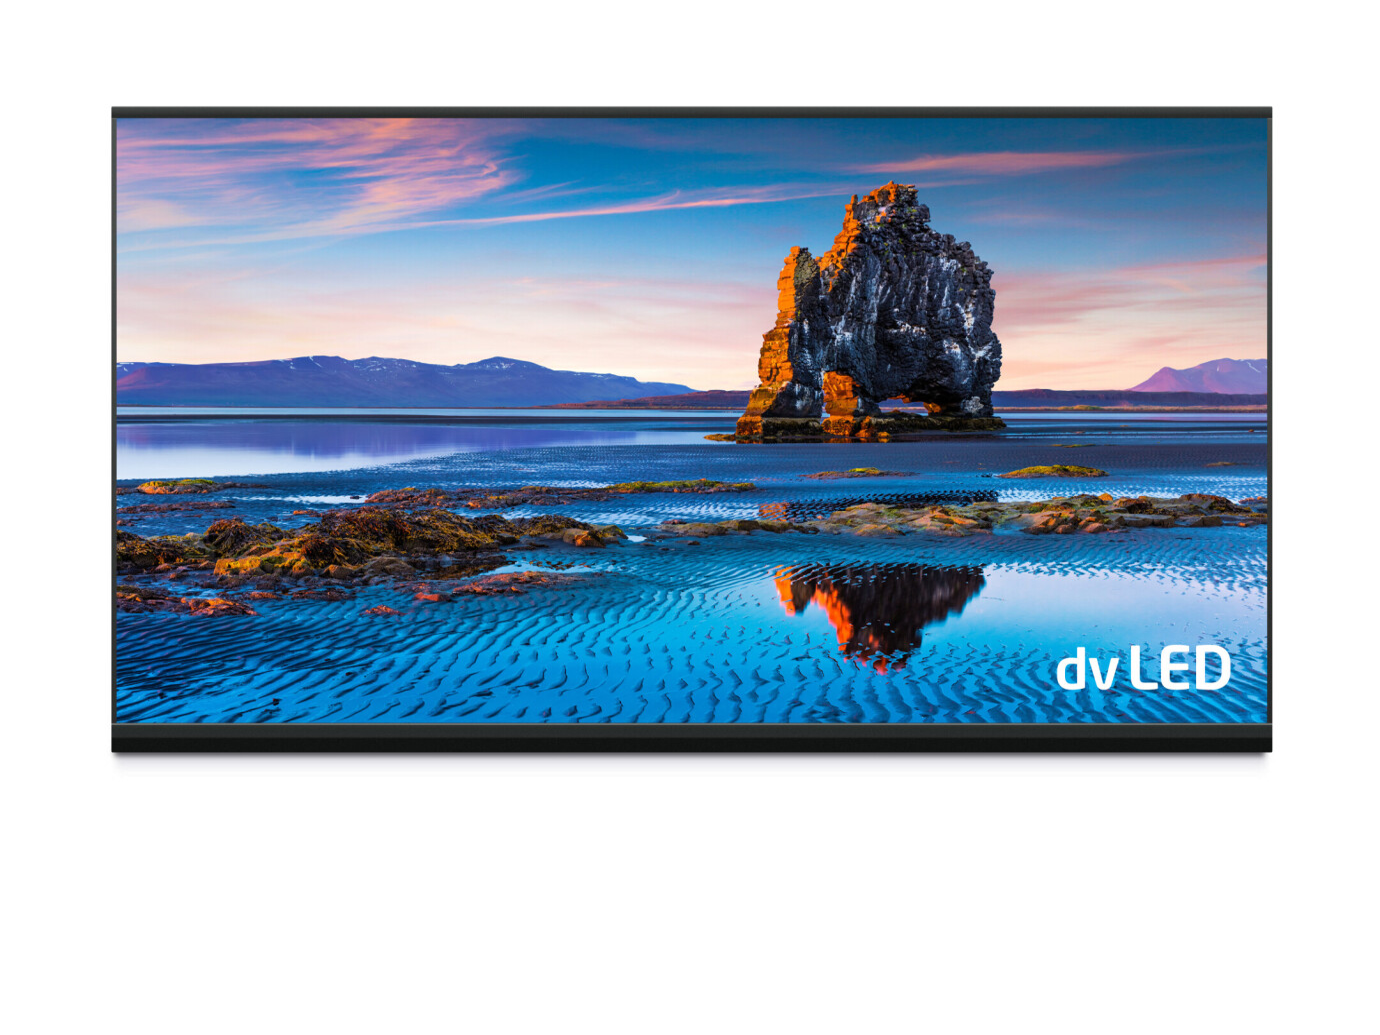 NEC LED-FE025i2-220 - Full HD Paket LED Wall 2,533mm Pixel Pitch